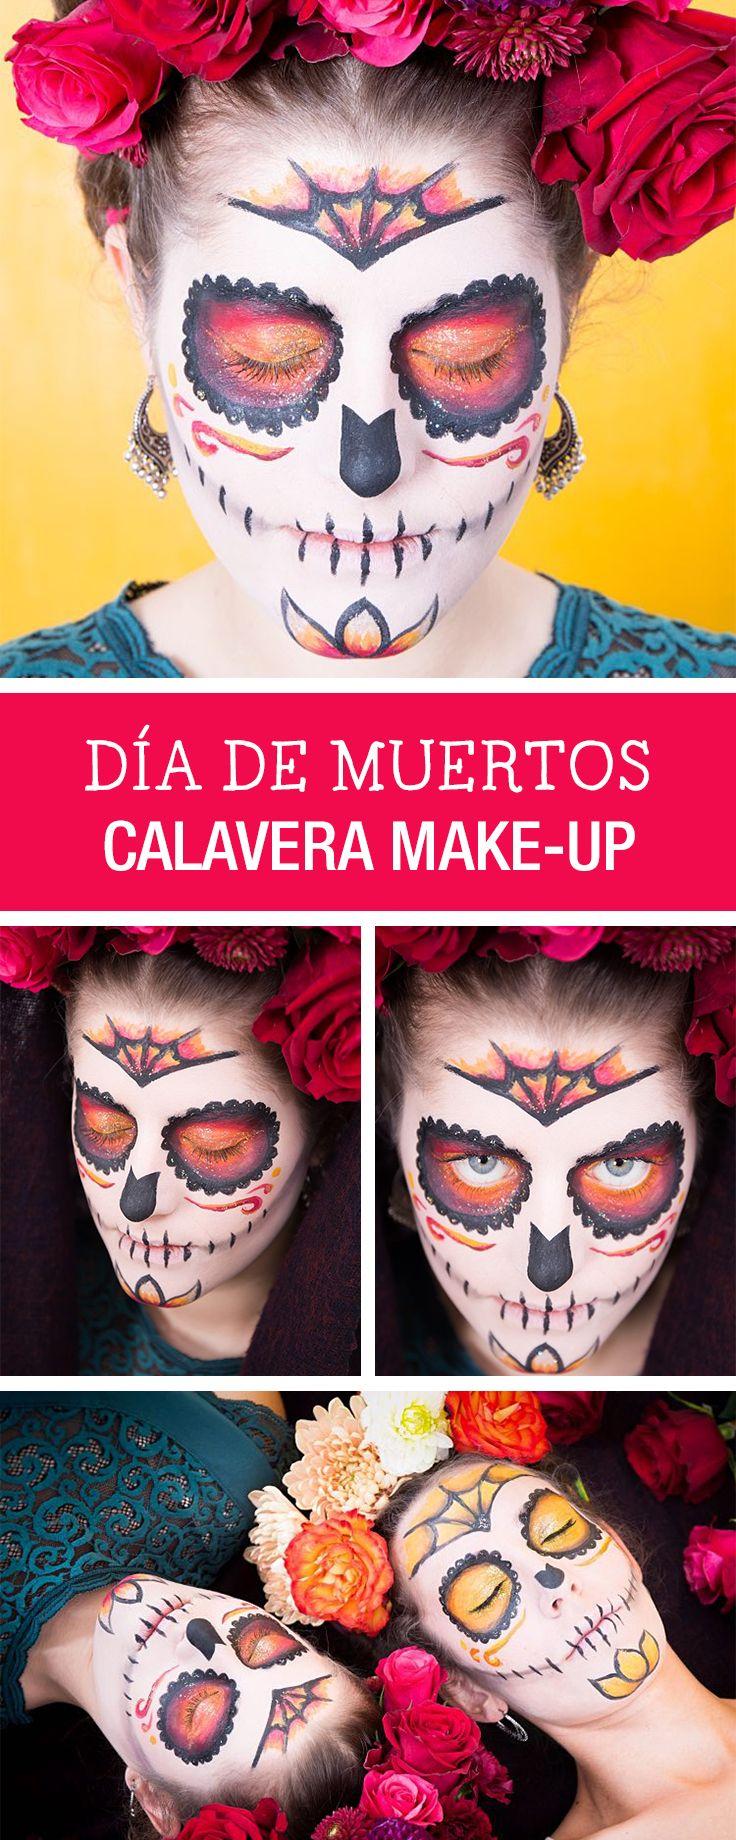 Dia de Muertos: Calavera Make-Up selbermachen, Halloween Kostüm / perfect halloween costume: how to make a calavera make up via DaWanda.com